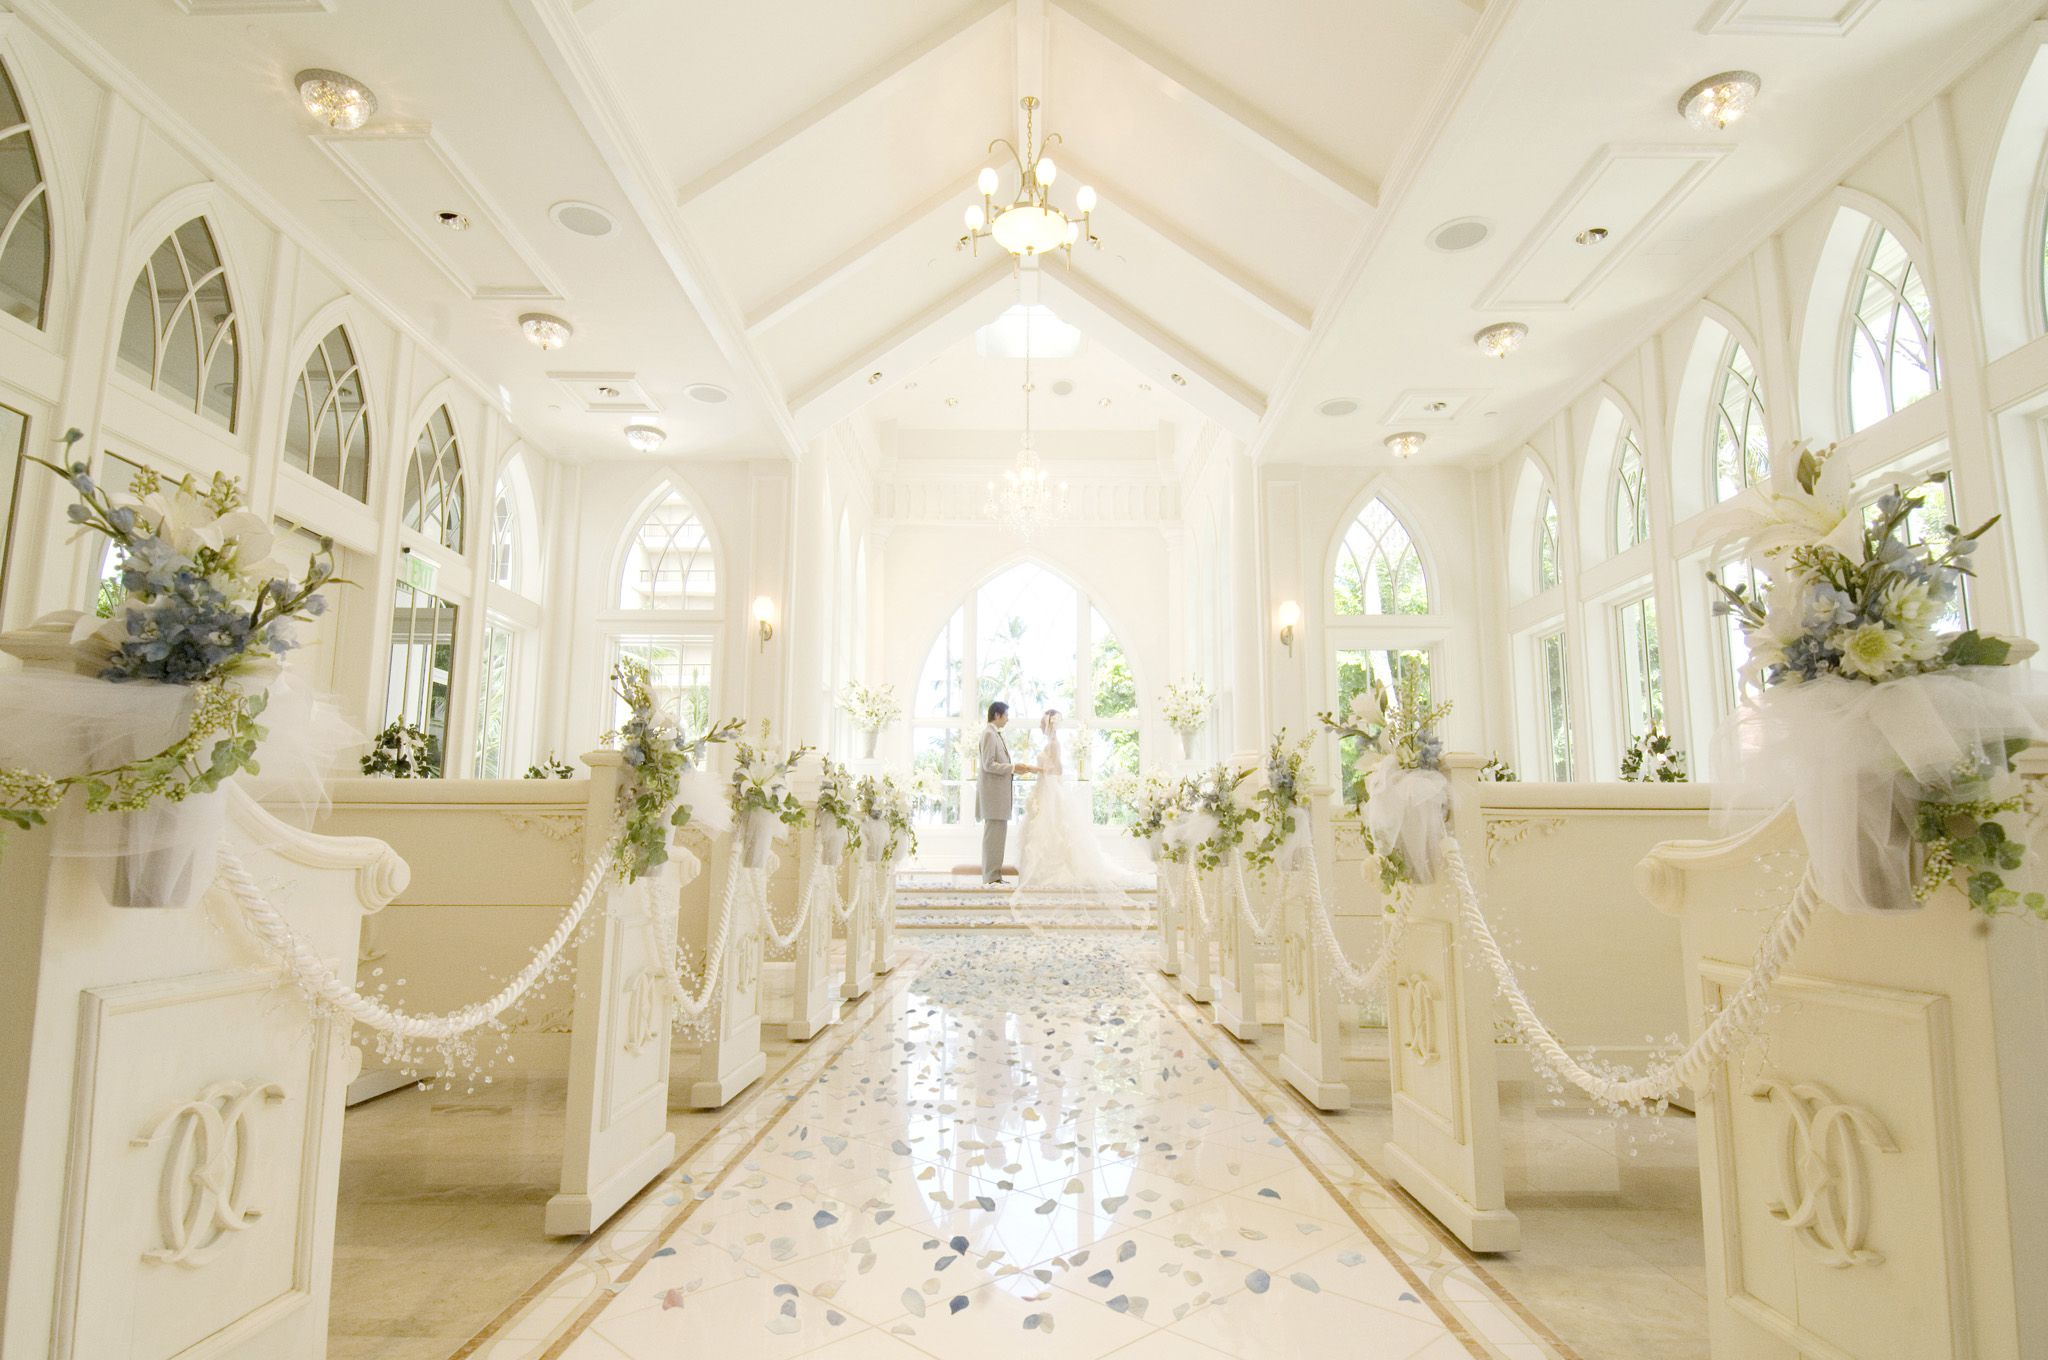 beautiful wedding chapels - Google Search | Wedding venues ...